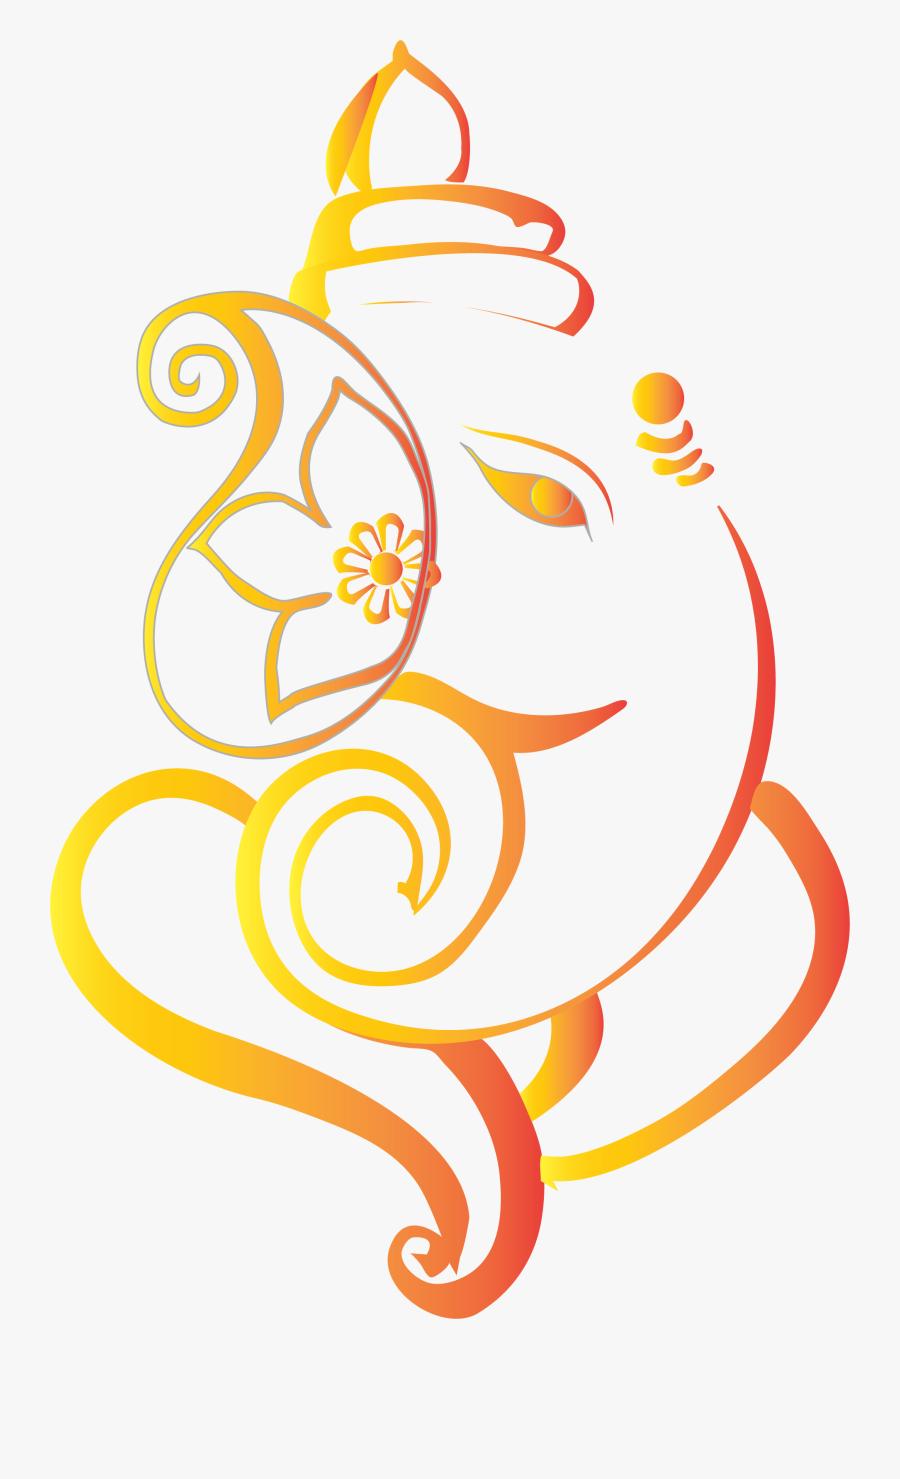 Transparent Ganesh Ji Clipart - Ganesh Vector, Transparent Clipart